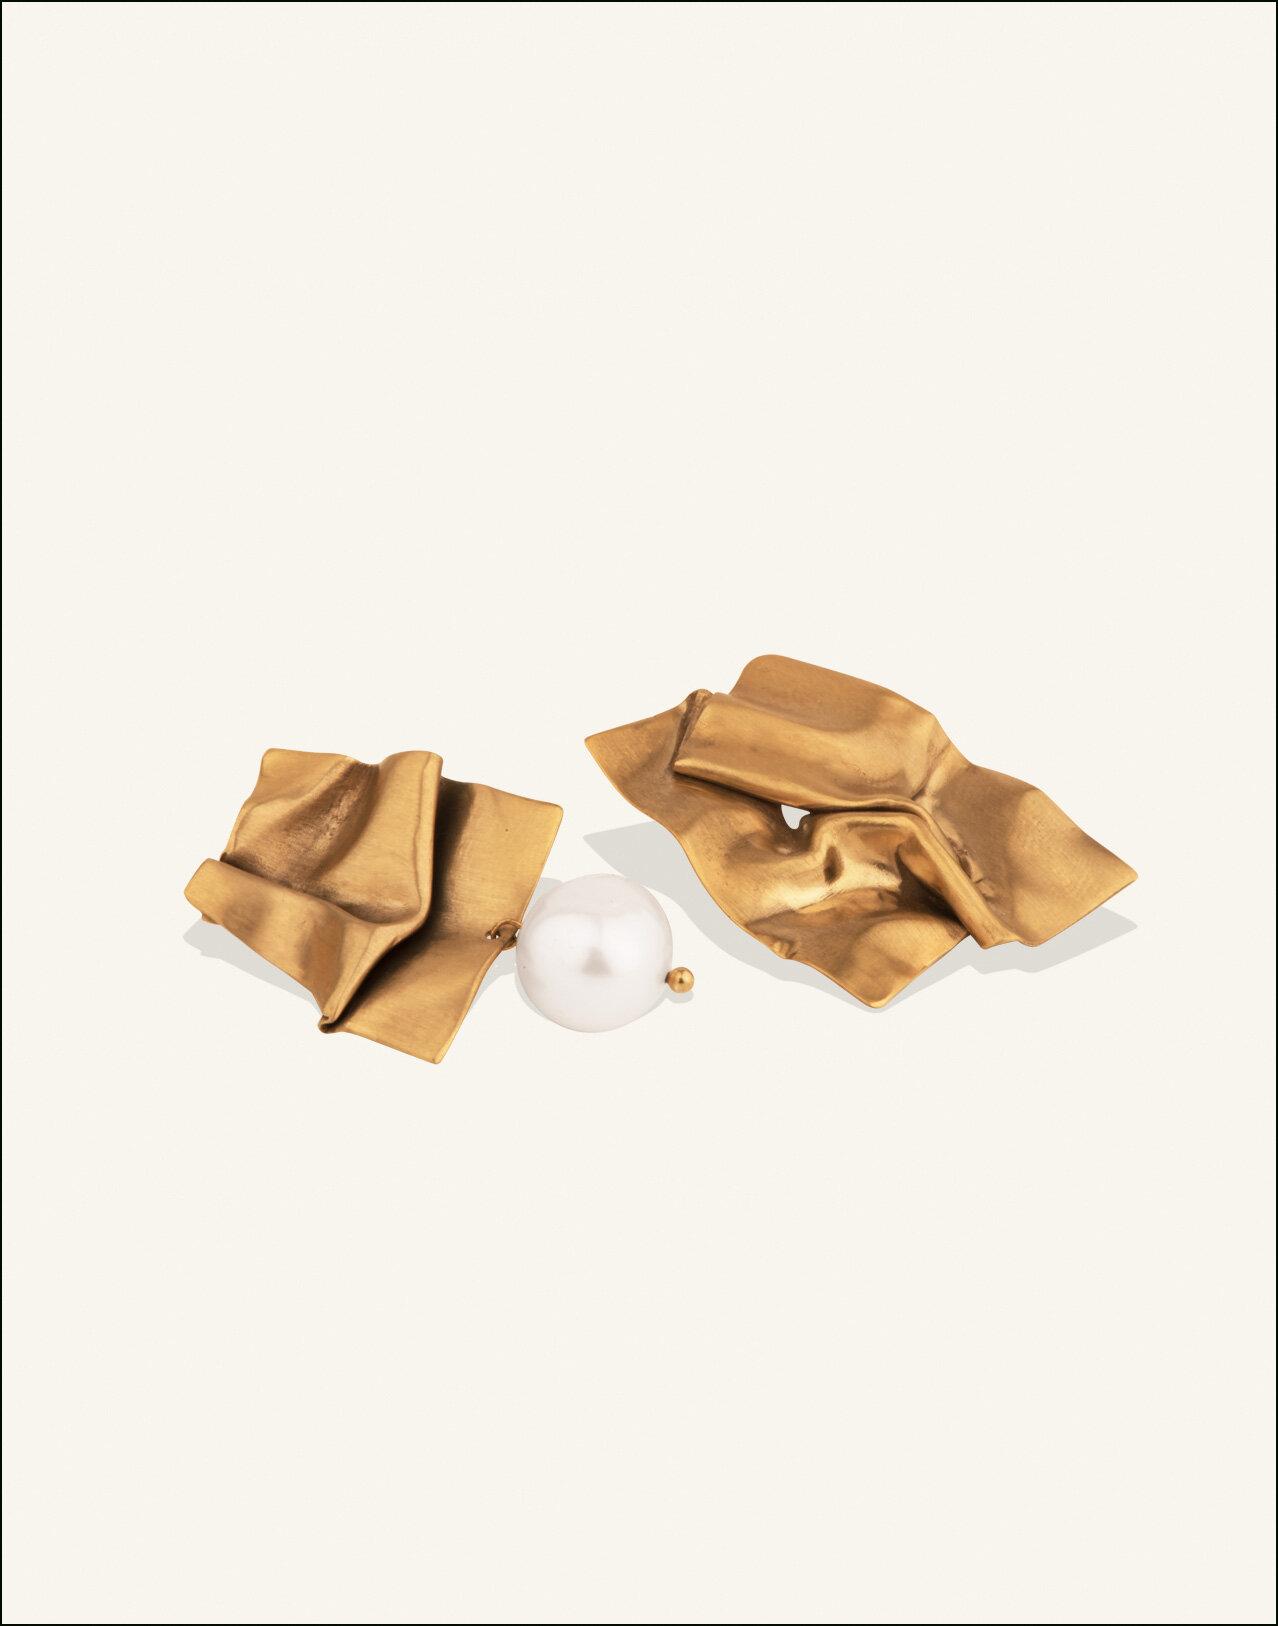 Completedworks-Gold-Vermeil-Earrings-Cohesion-3.jpg